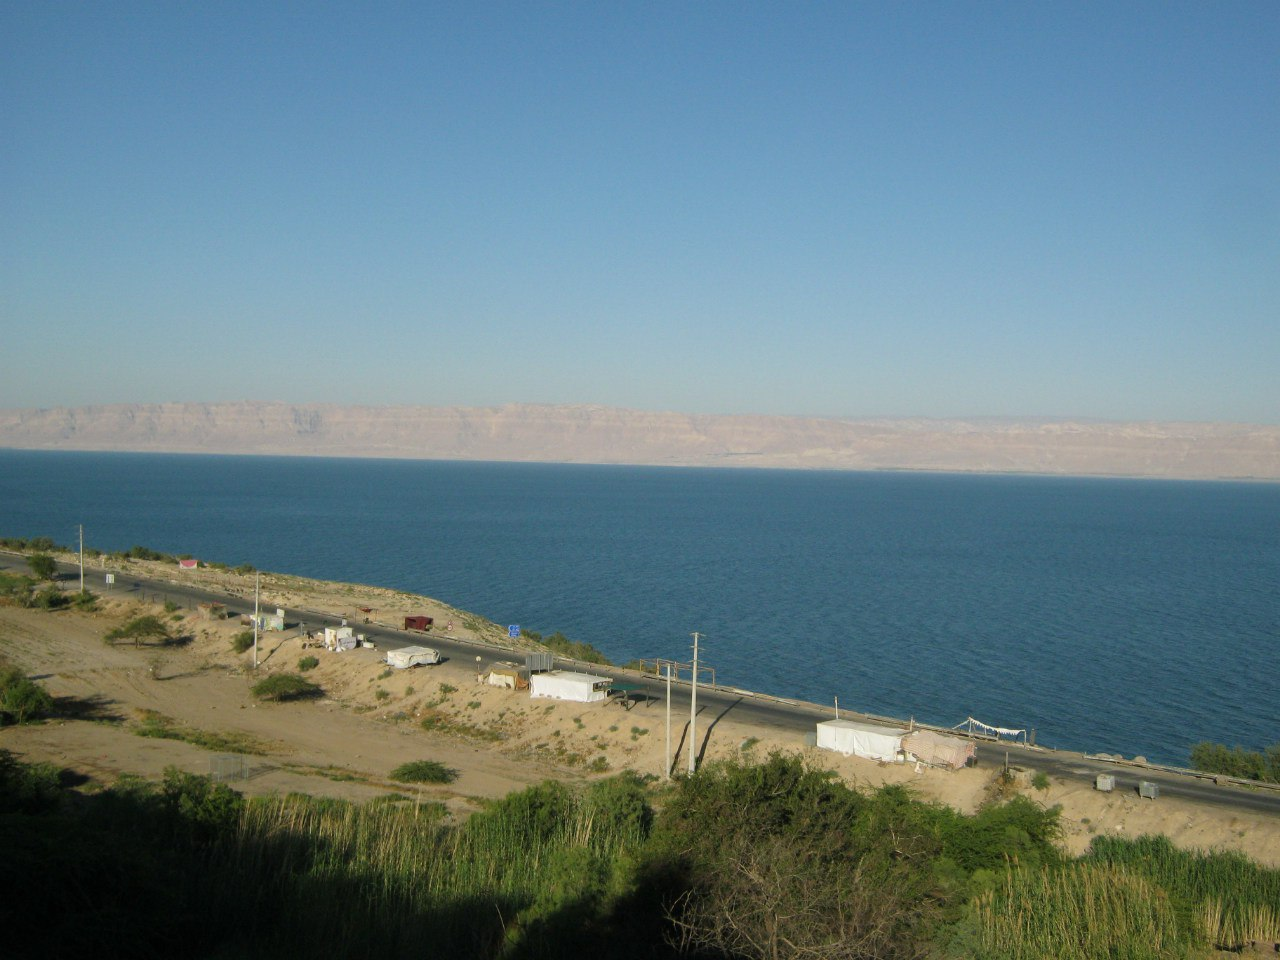 Вид на мёртвое море и израиль